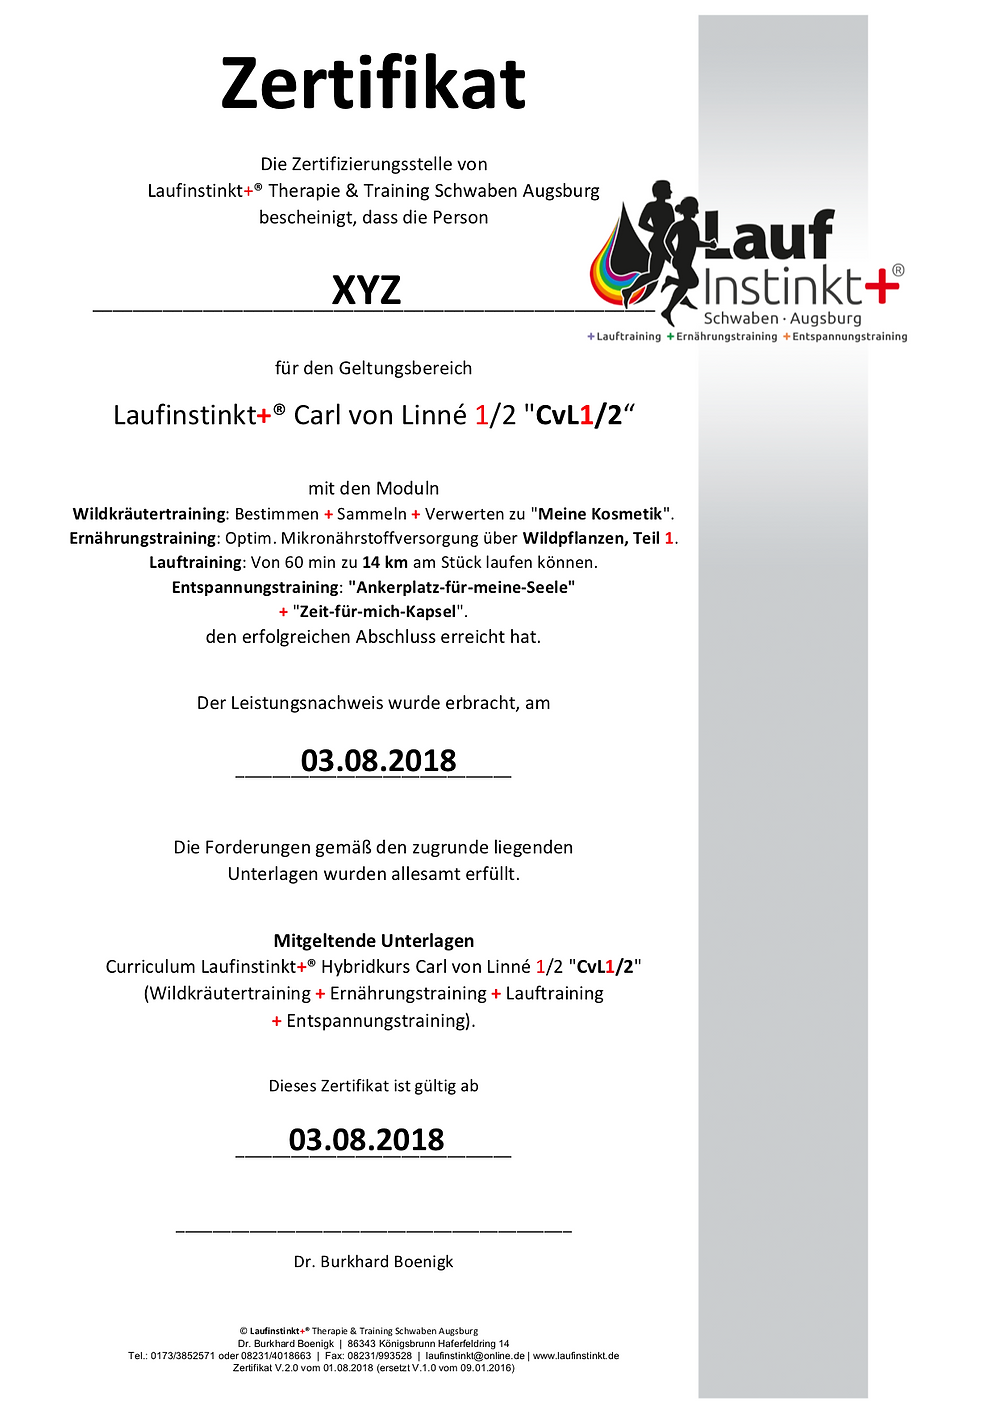 Laufinstinkt.de - Hybridkurs CvL1/2 2018 - Bild 1